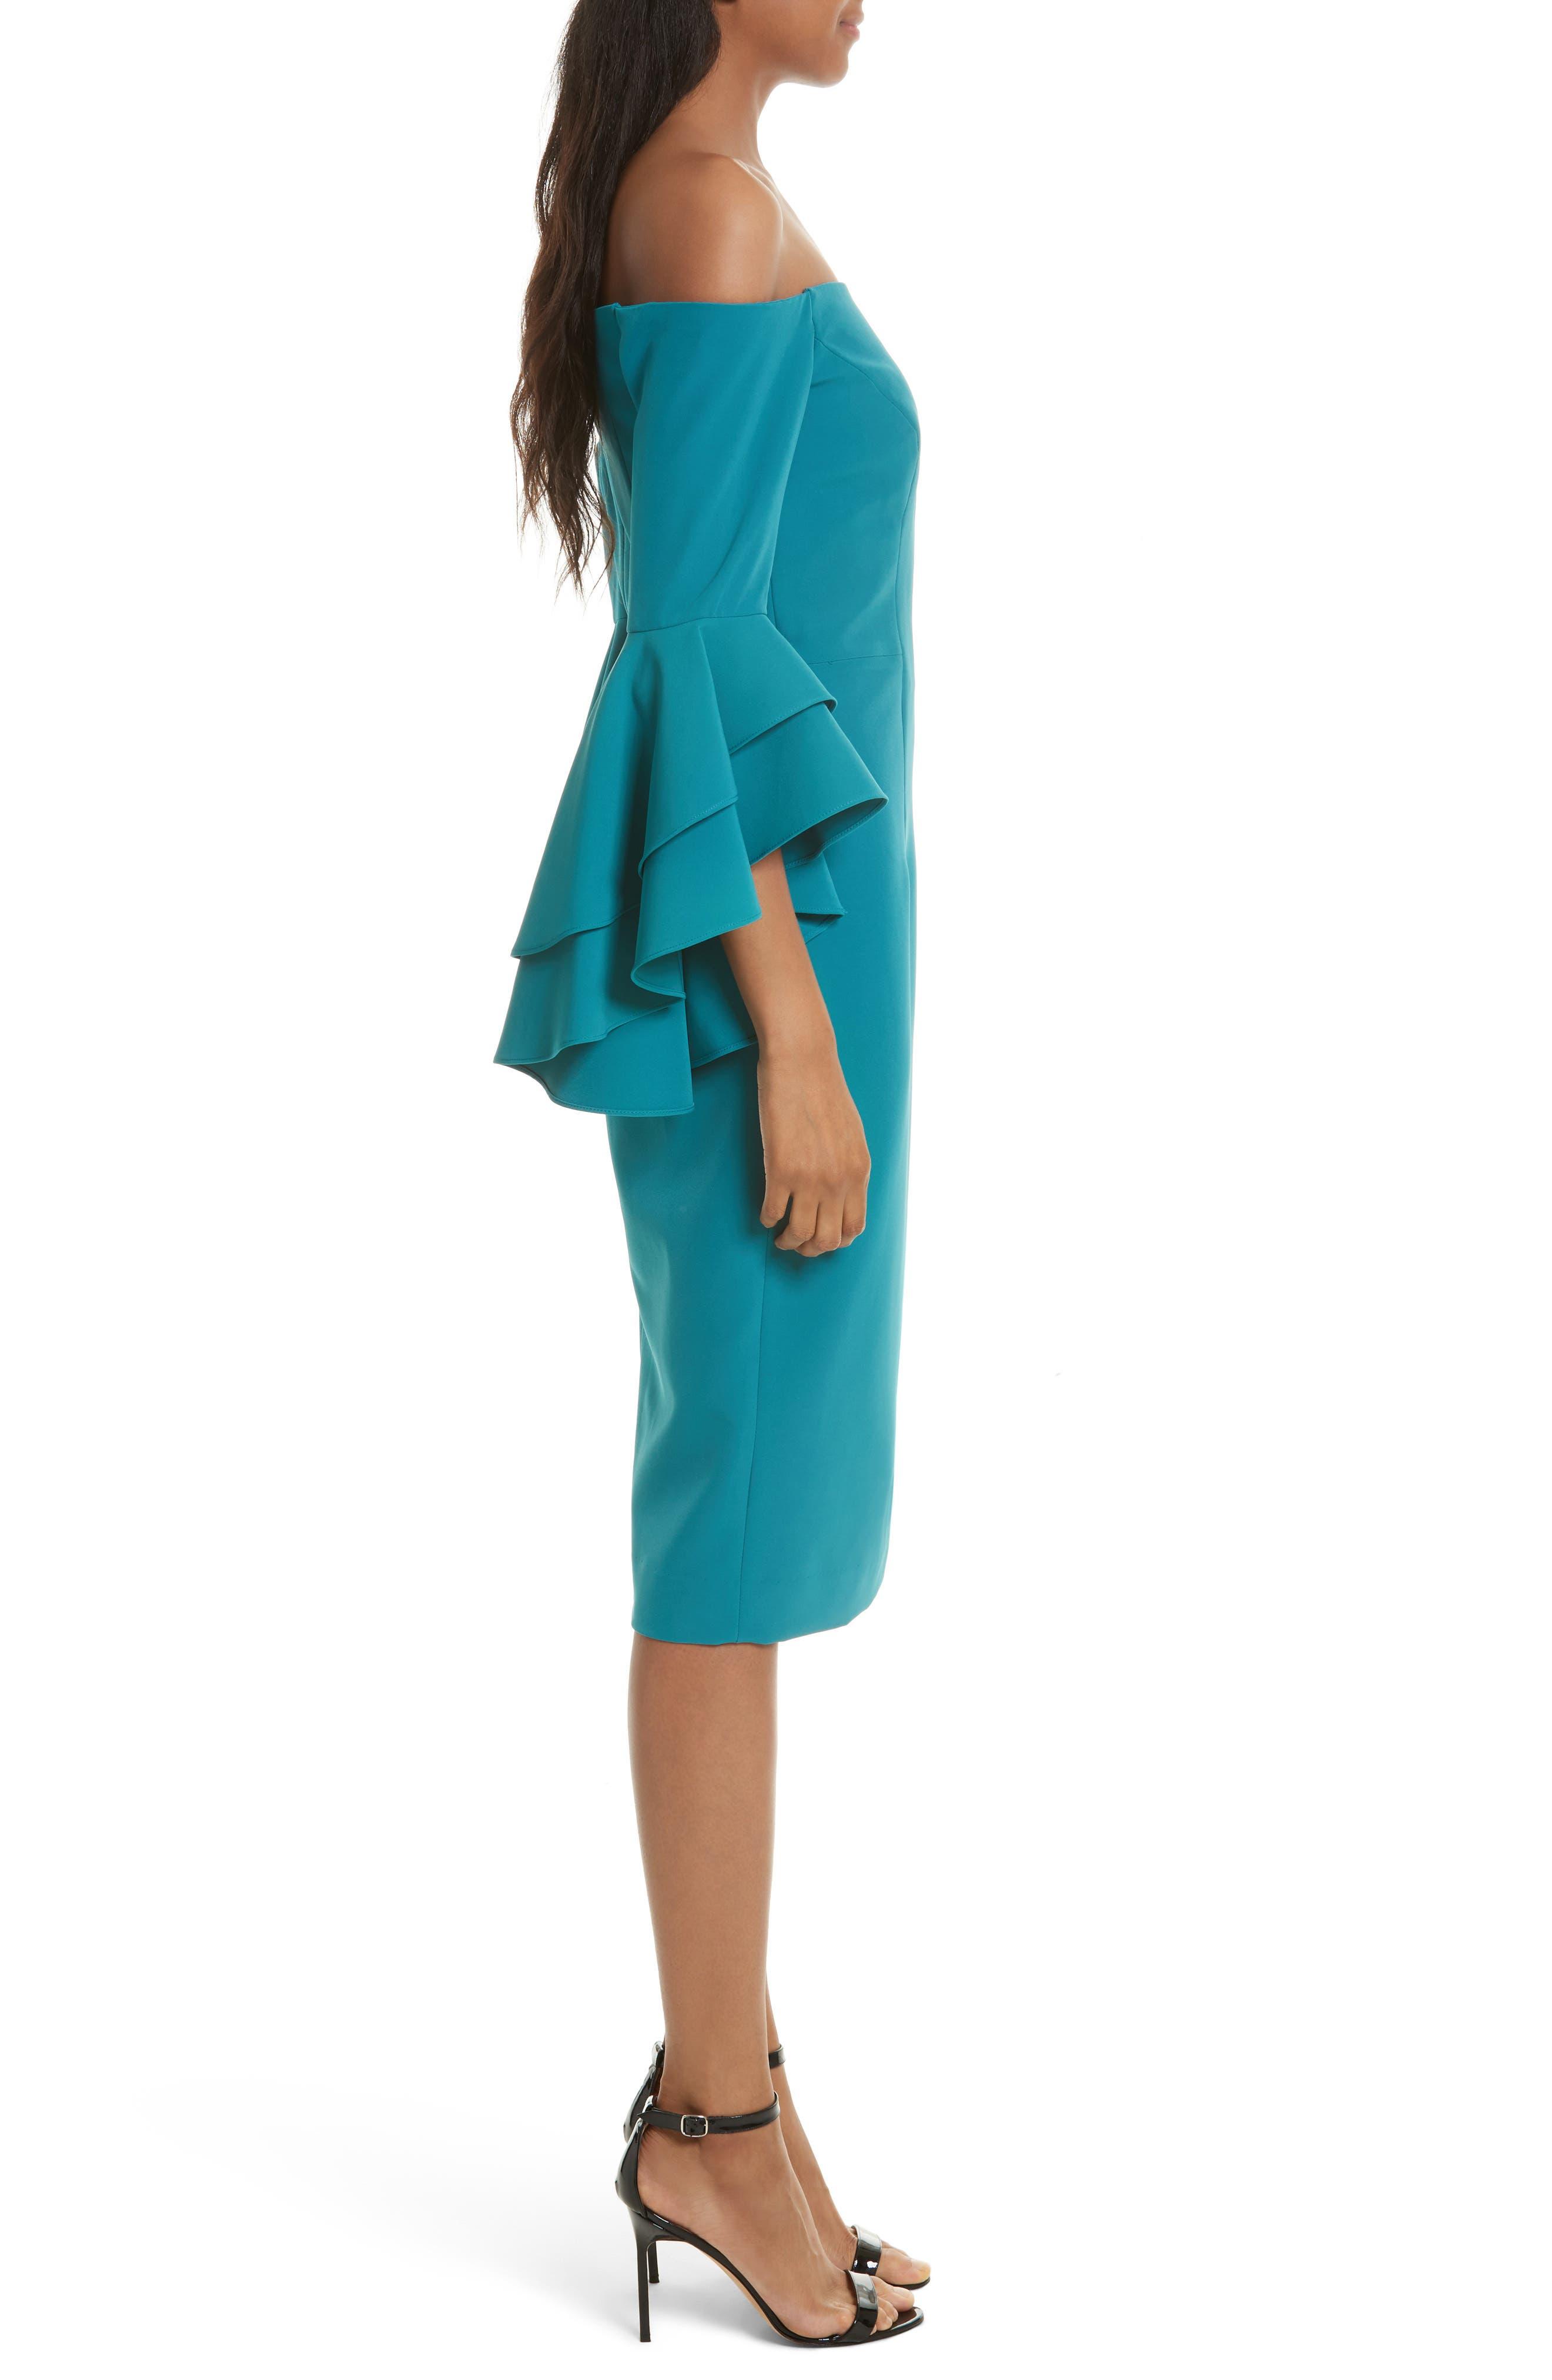 MILLY, Selena Off the Shoulder Midi Dress, Alternate thumbnail 3, color, 442